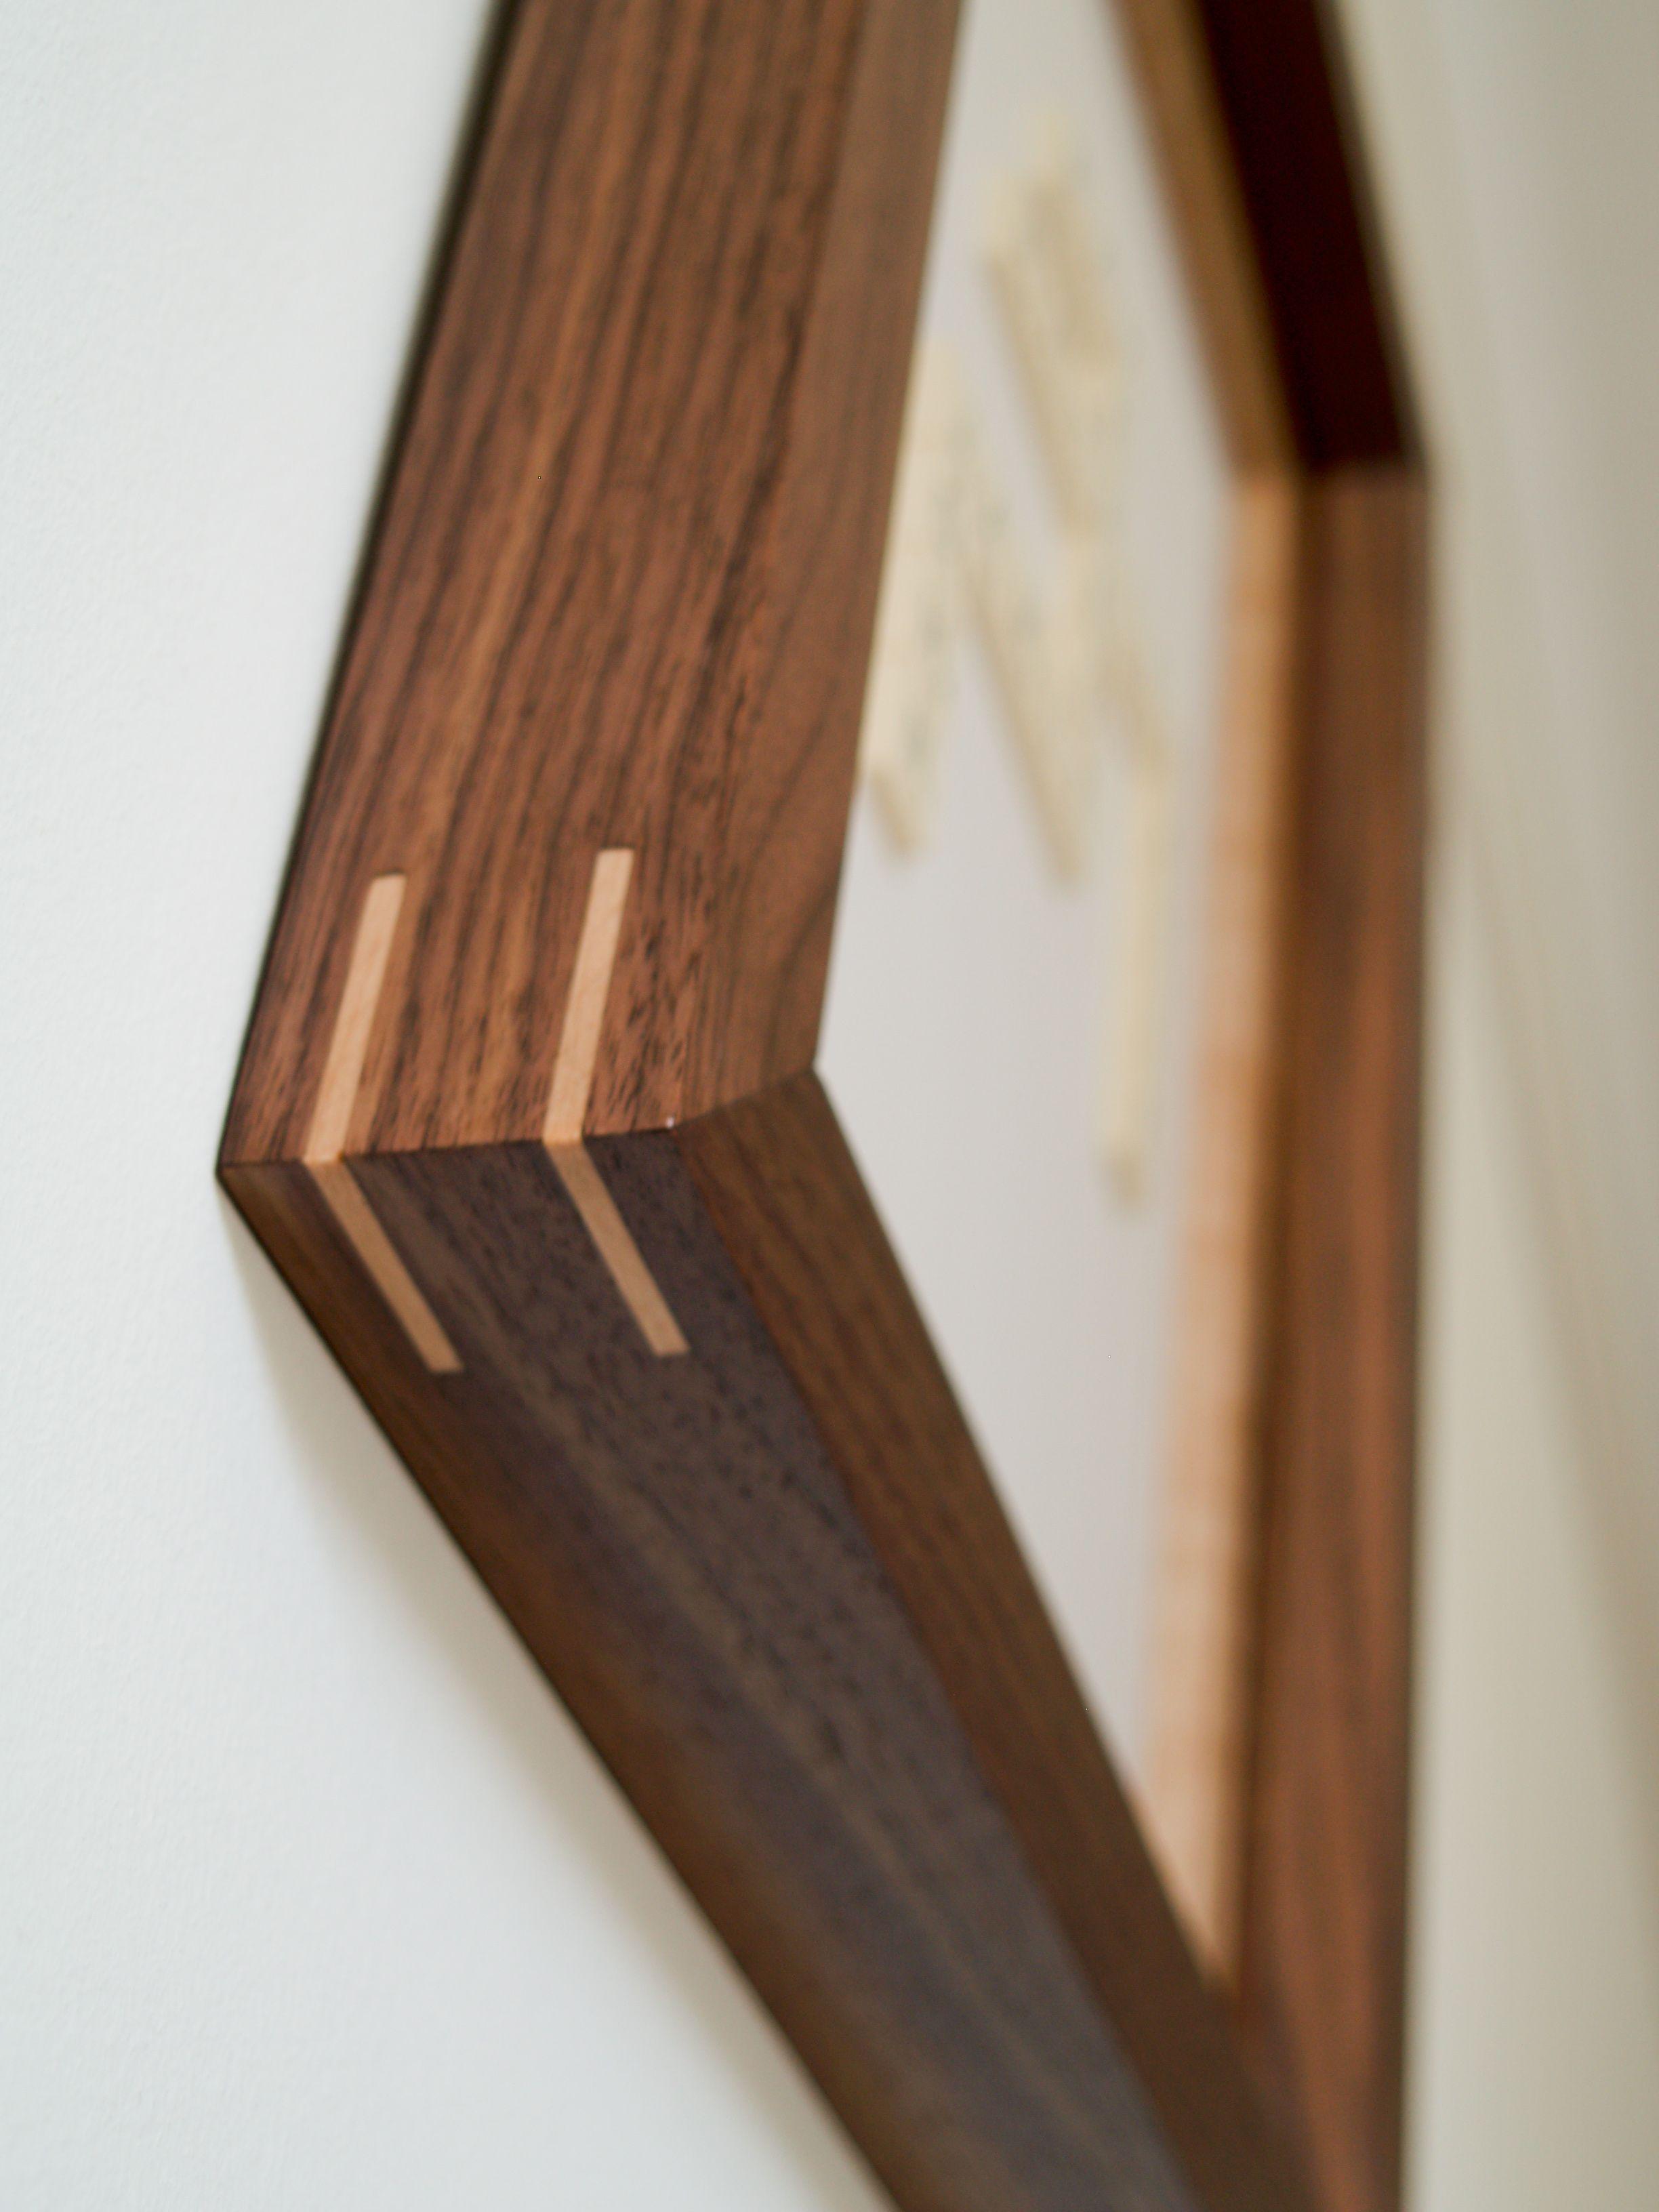 Walnut And Birdseye Maple Hand Made Wood Picture Frame Made By Soulwood Wood Picture Frames Wooden Picture Frames Picture Frame Designs